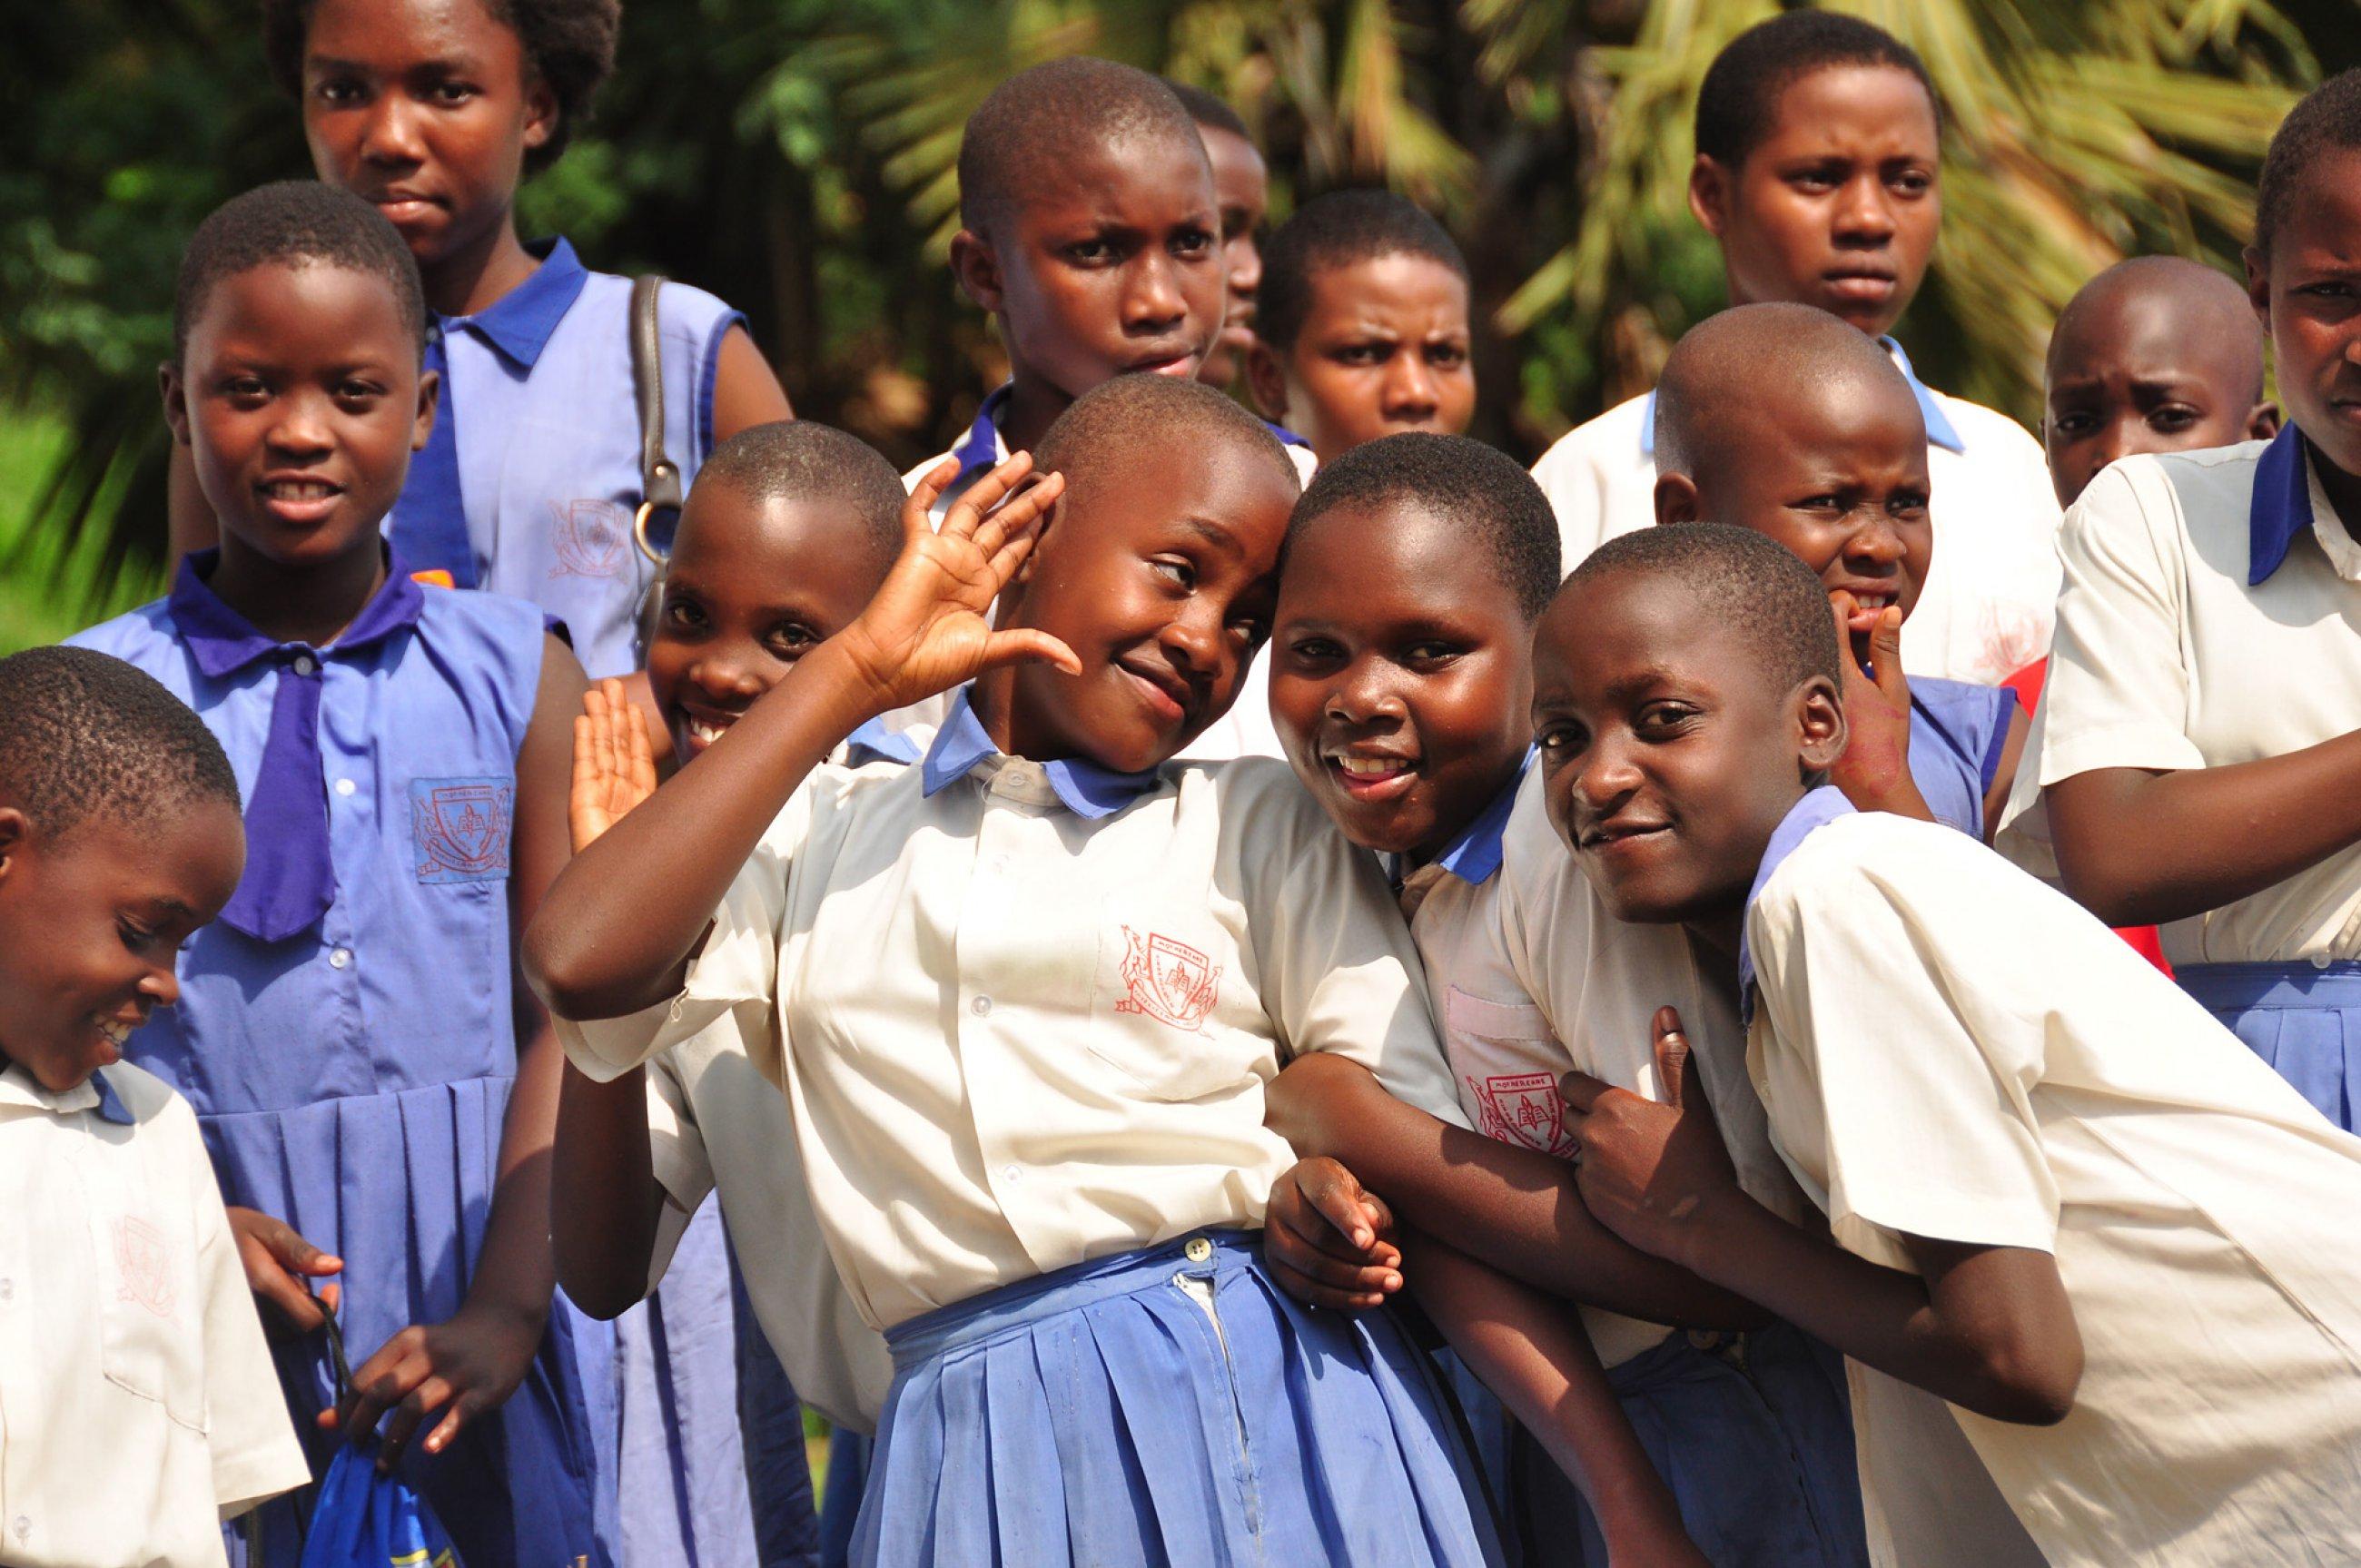 https://bubo.sk/uploads/galleries/4986/burundi-rwanda-uganda-kongo-martin-karnis-14-.jpg